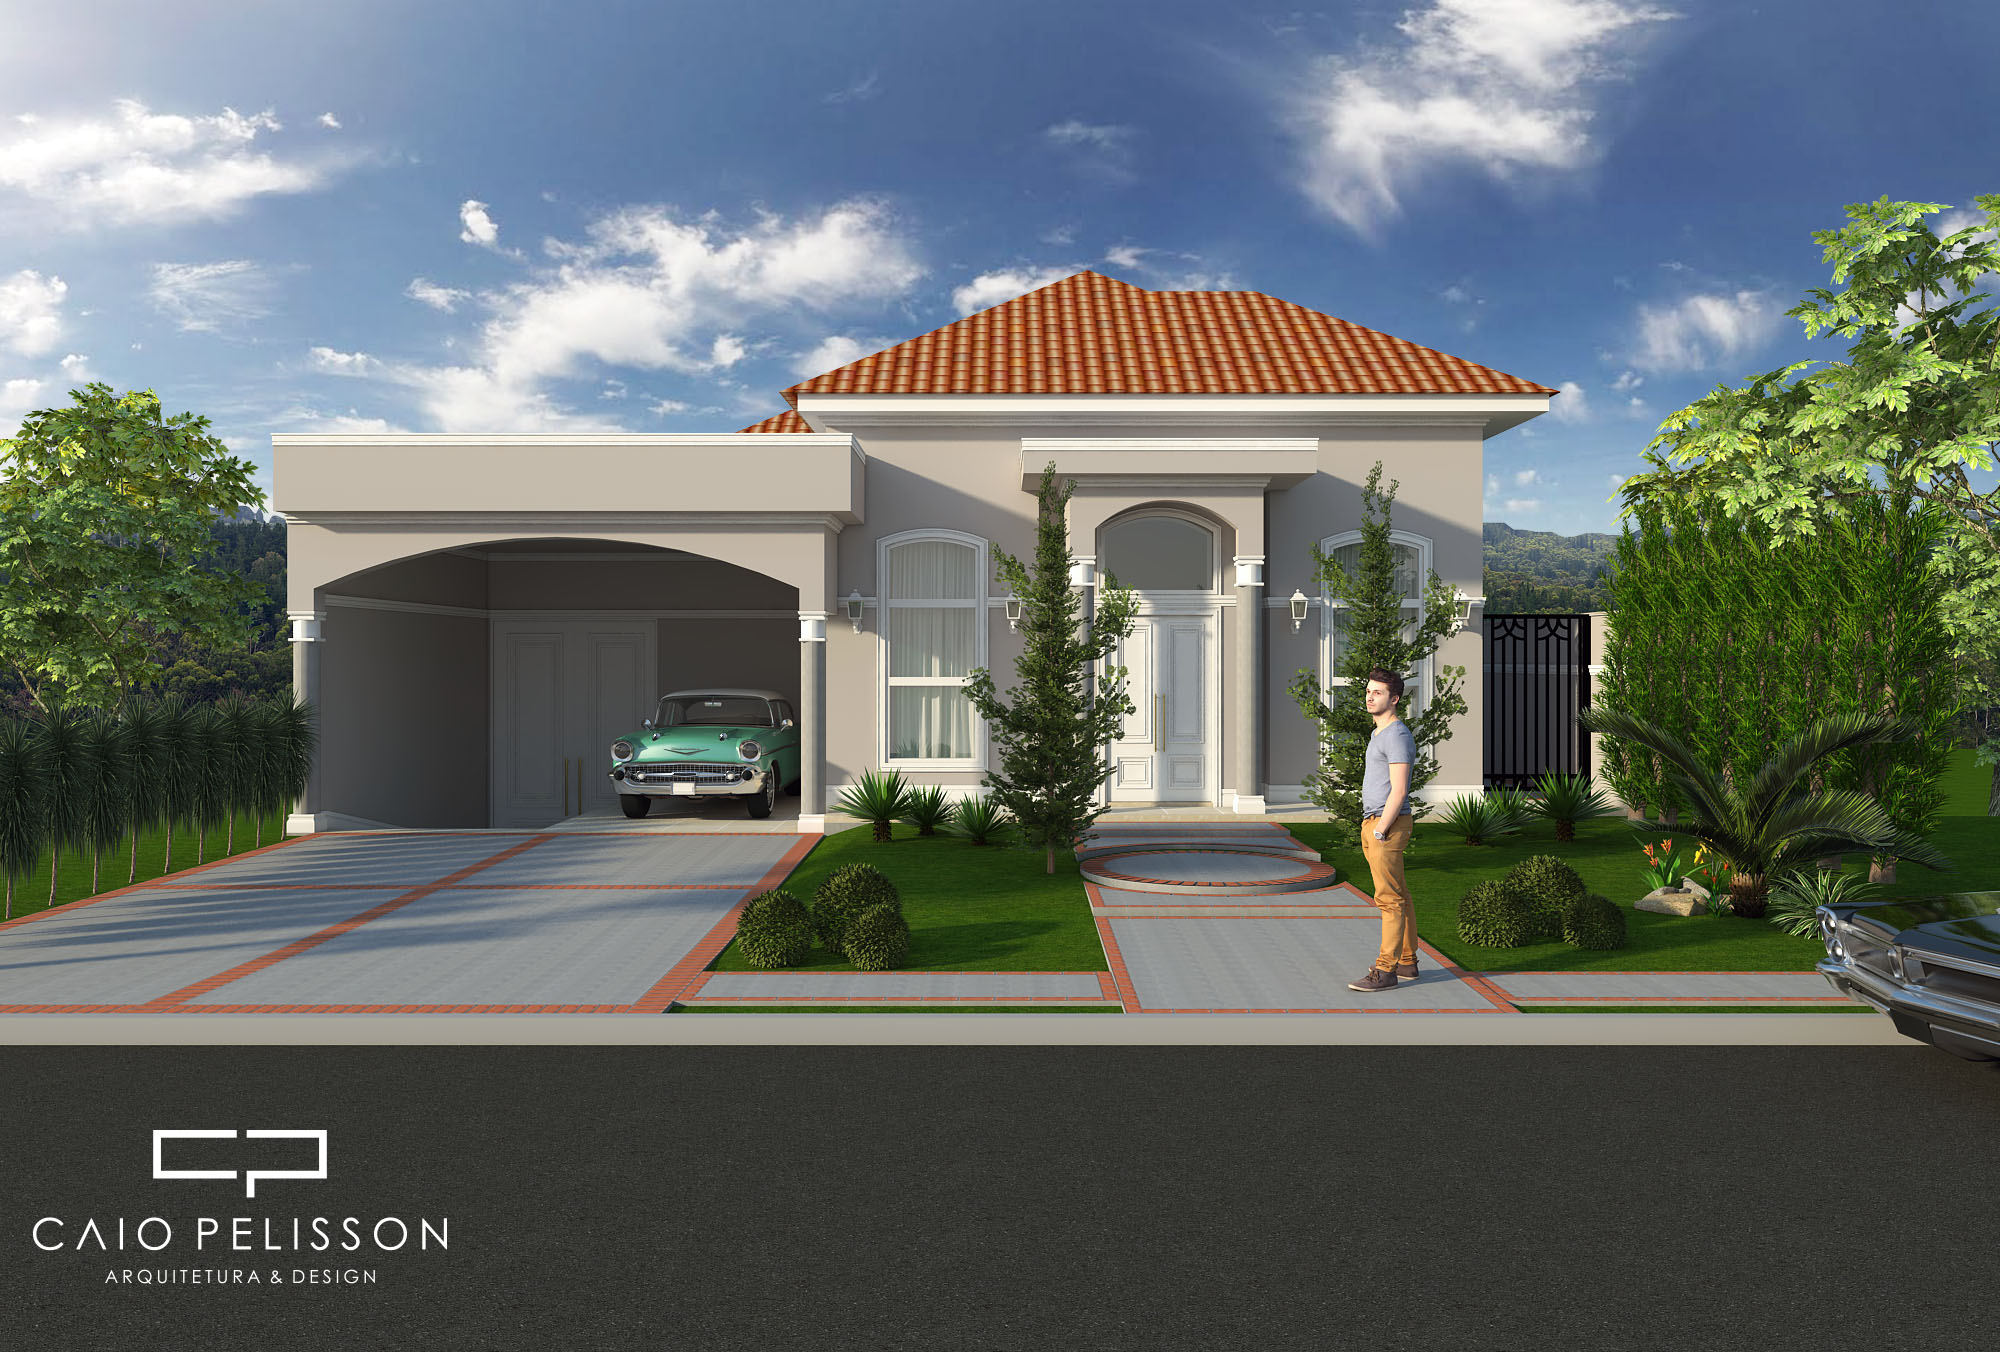 Projeto casa neoclassica estilo americano telhado aparente - Casas estilo americano ...